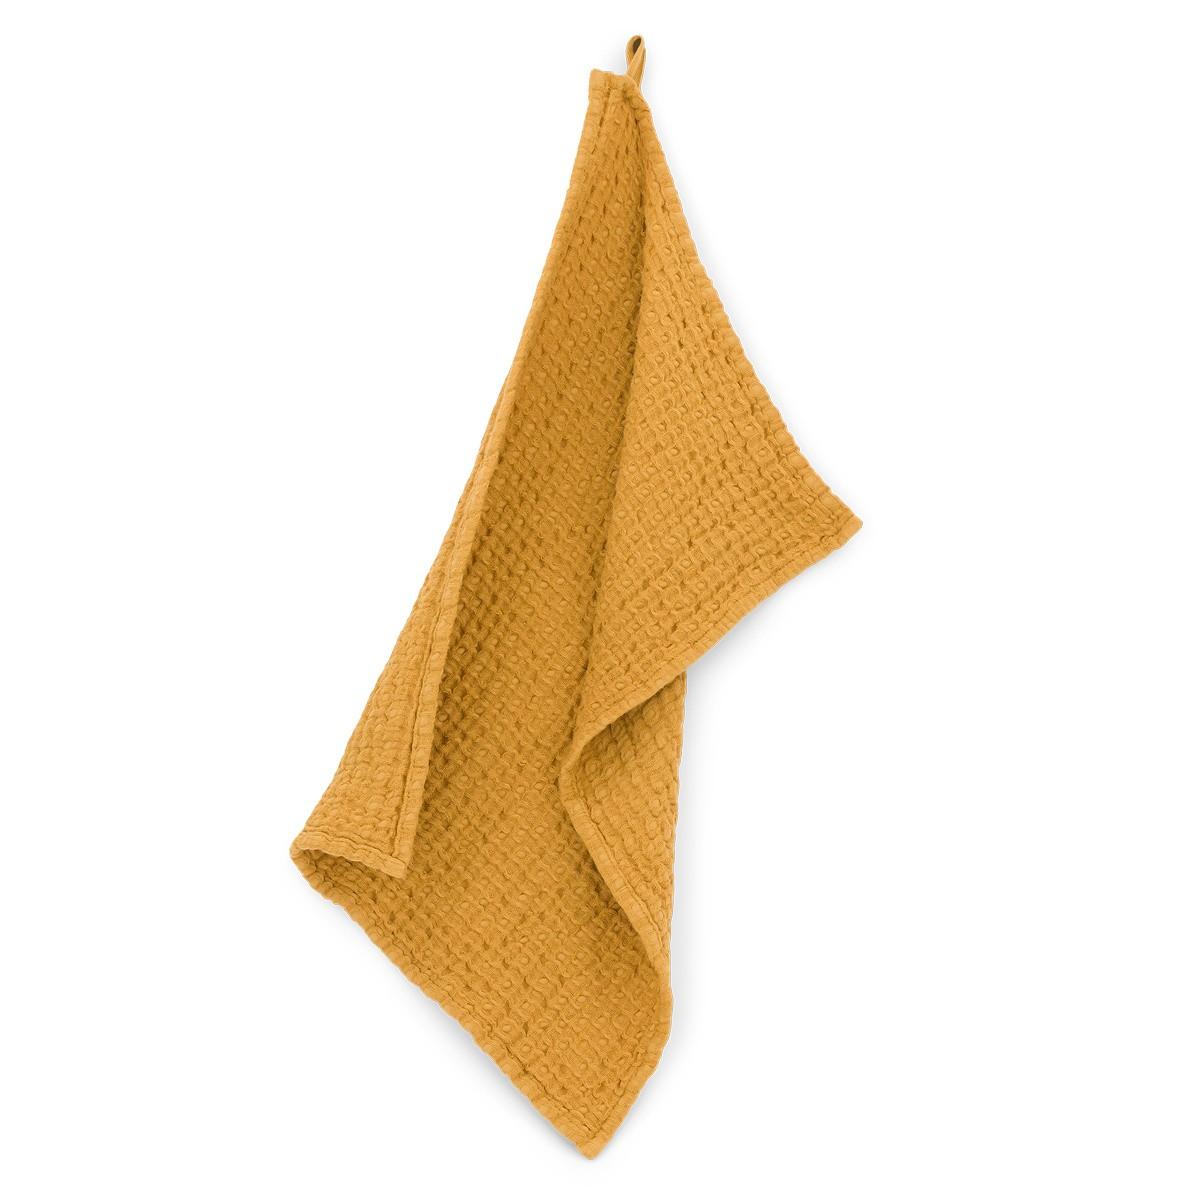 Cucina Towel, Mustard